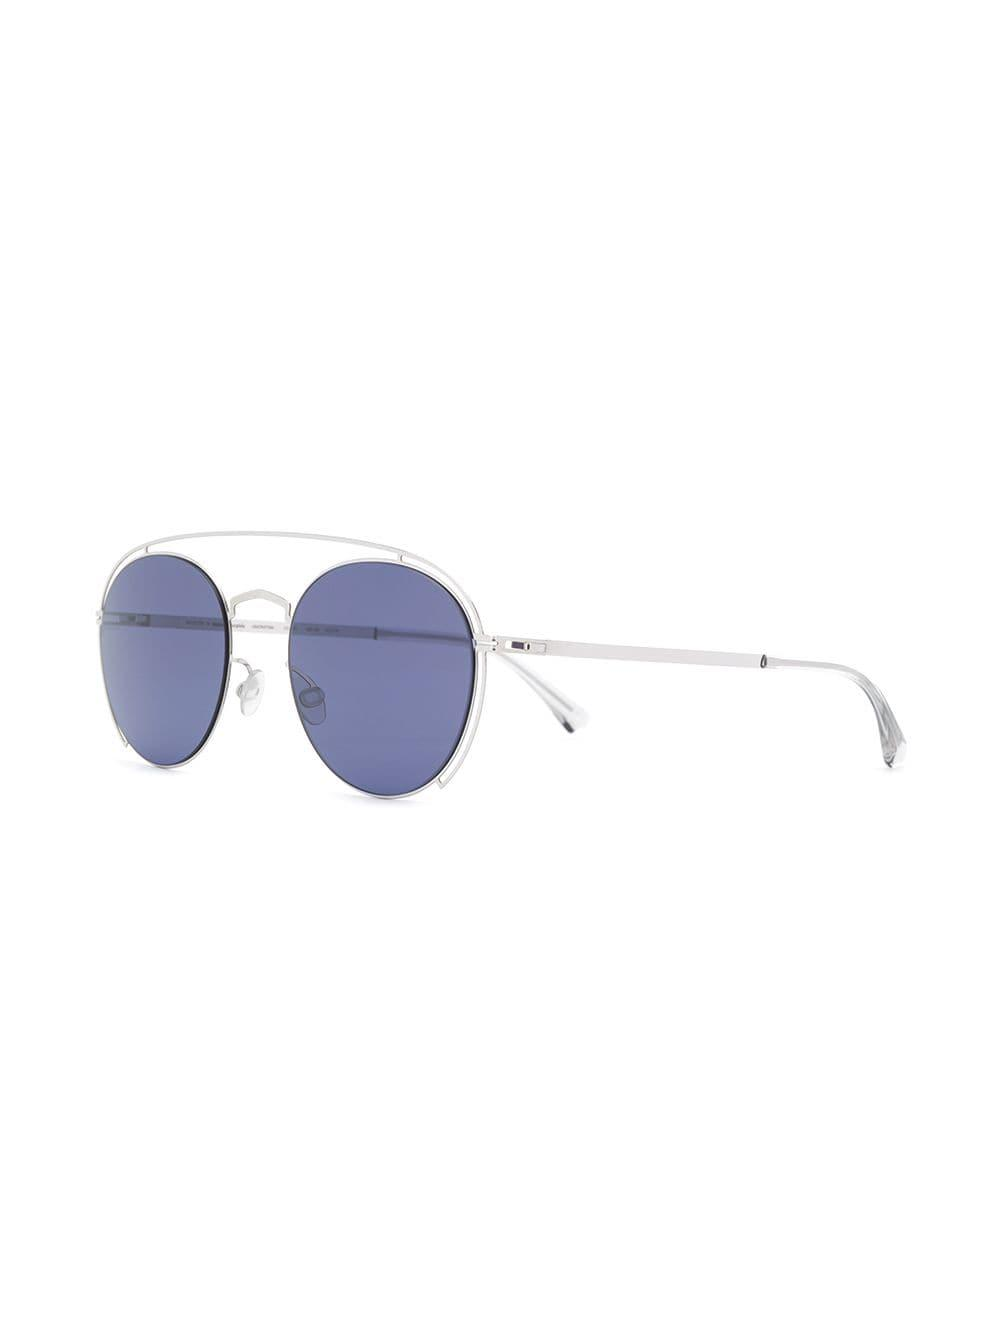 91fd63eccde Mykita Round Tinted Sunglasses in Metallic - Lyst